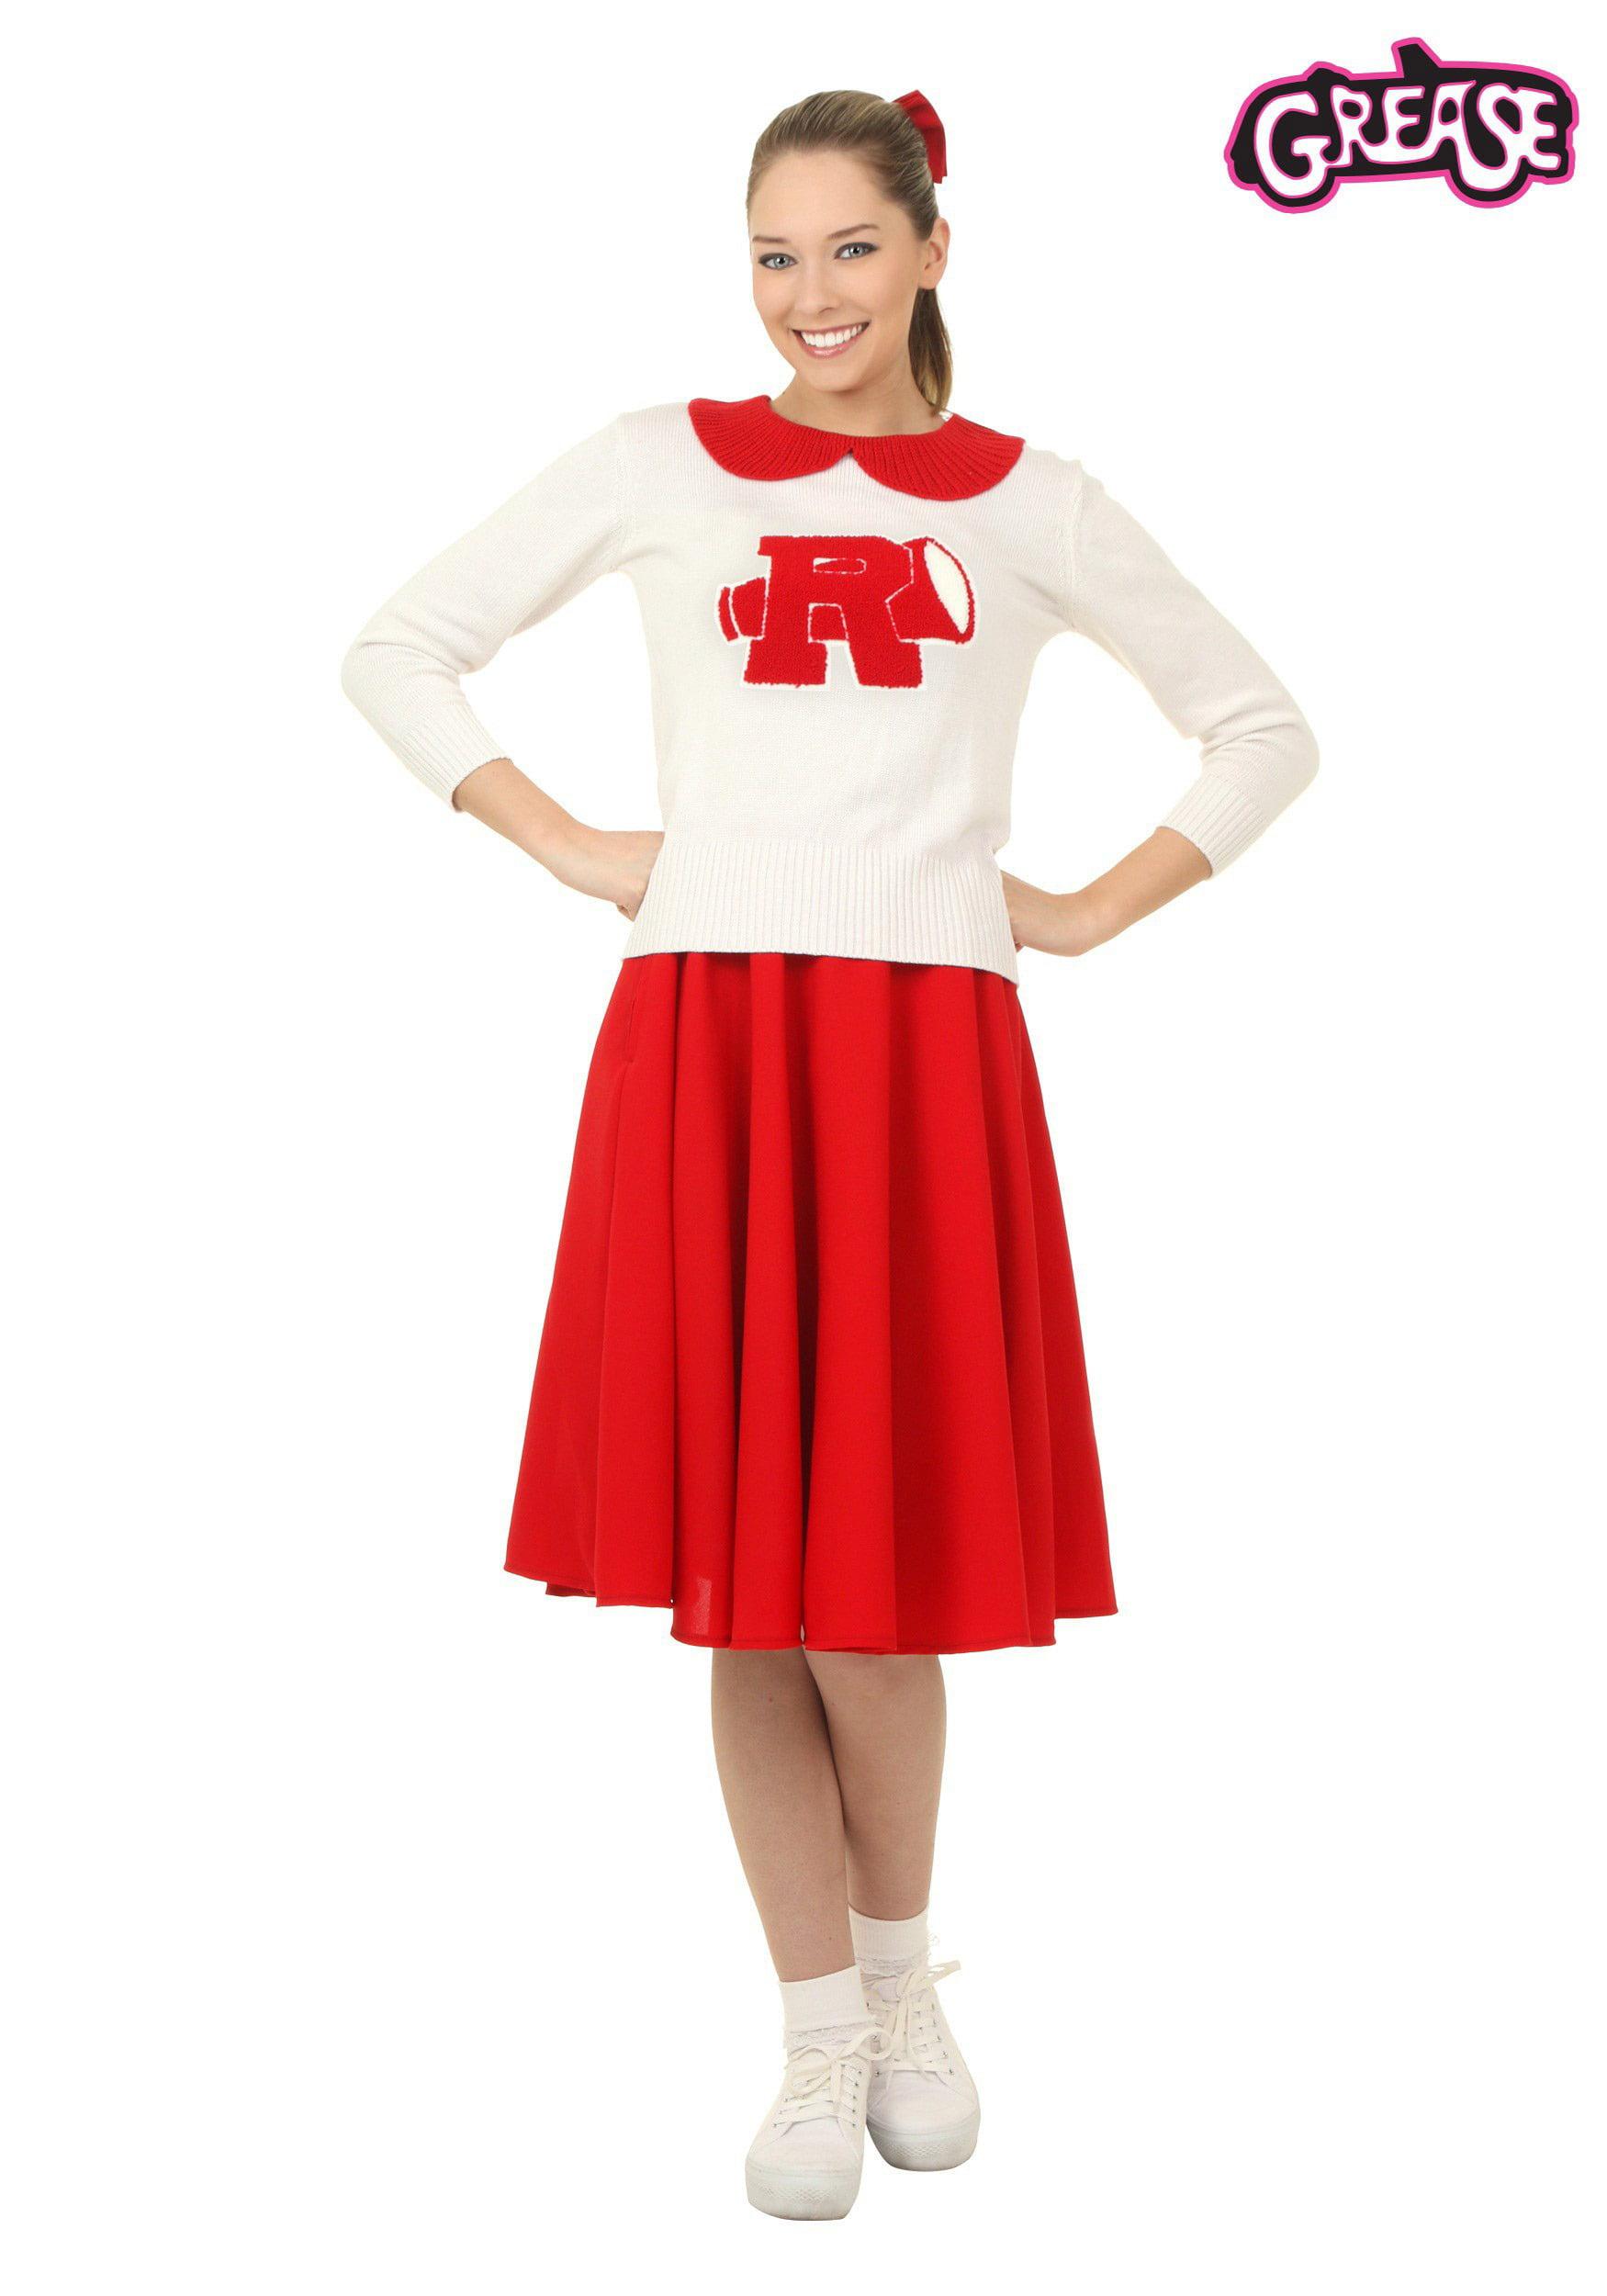 sc 1 st  Walmart & Womenu0027s Grease Rydell High Cheerleader Costume - Walmart.com